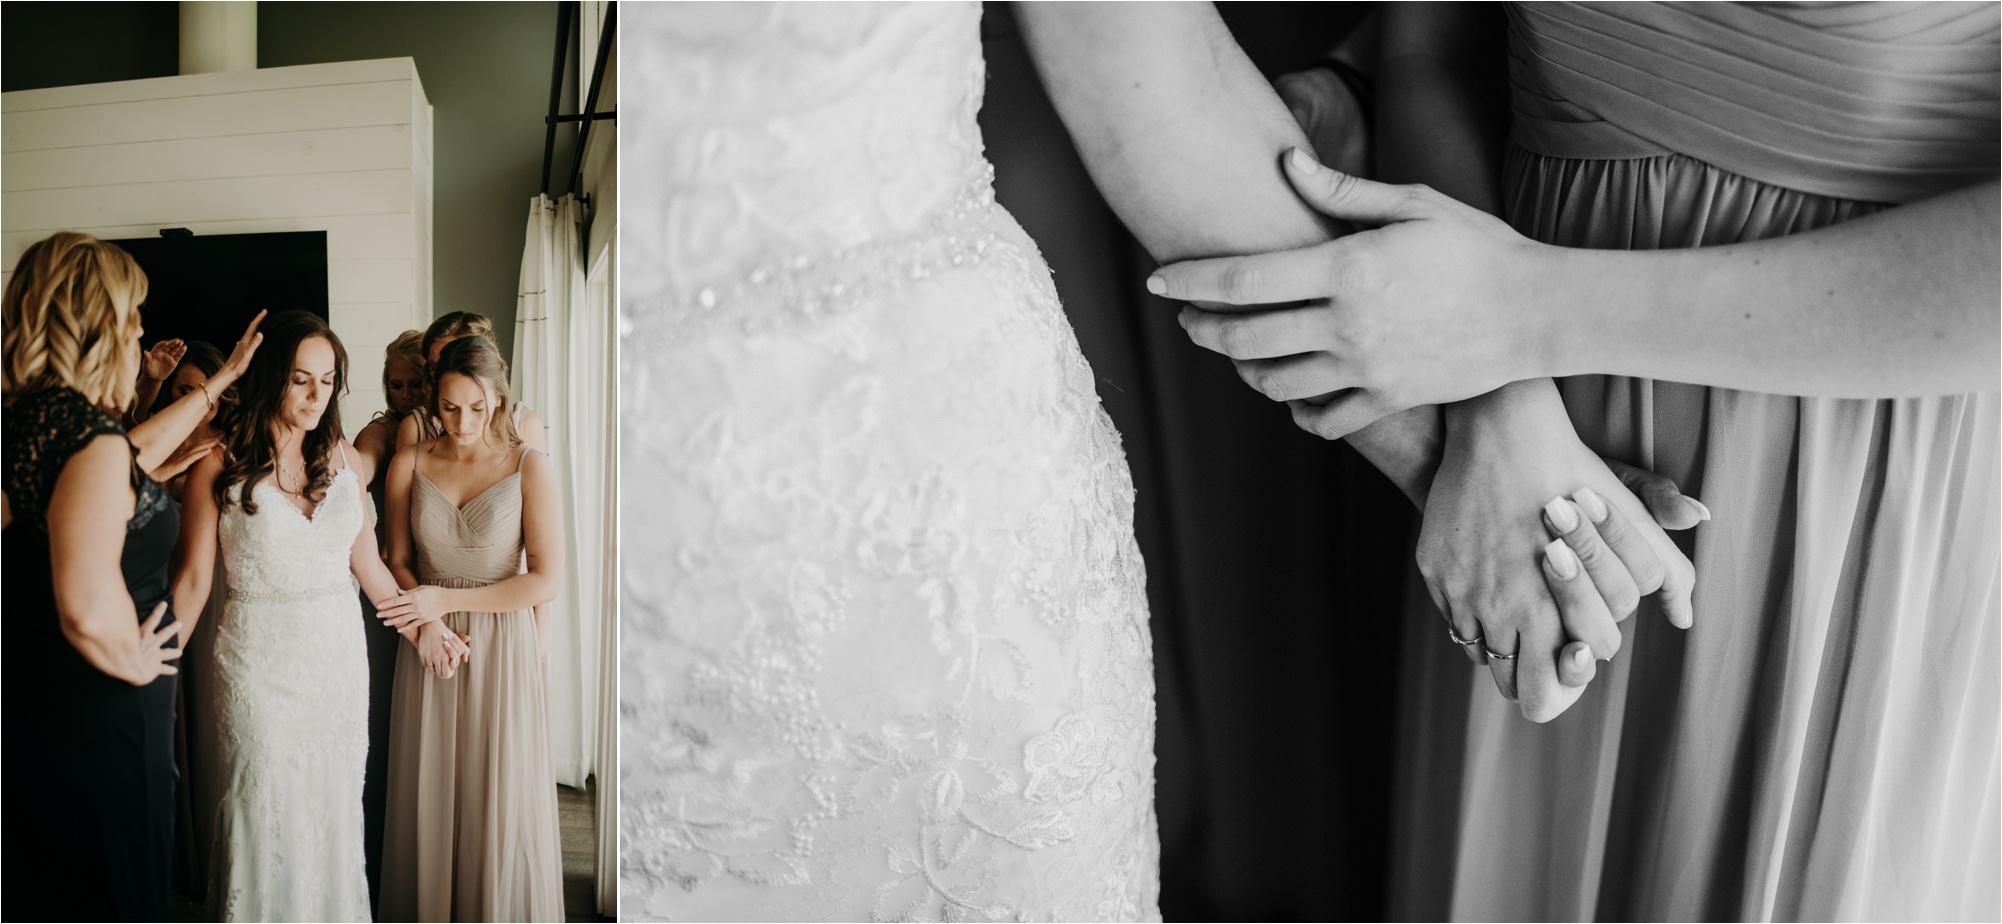 The Barn and Black Ridge Wedding Minneapolis Wedding Photographer_4123.jpg